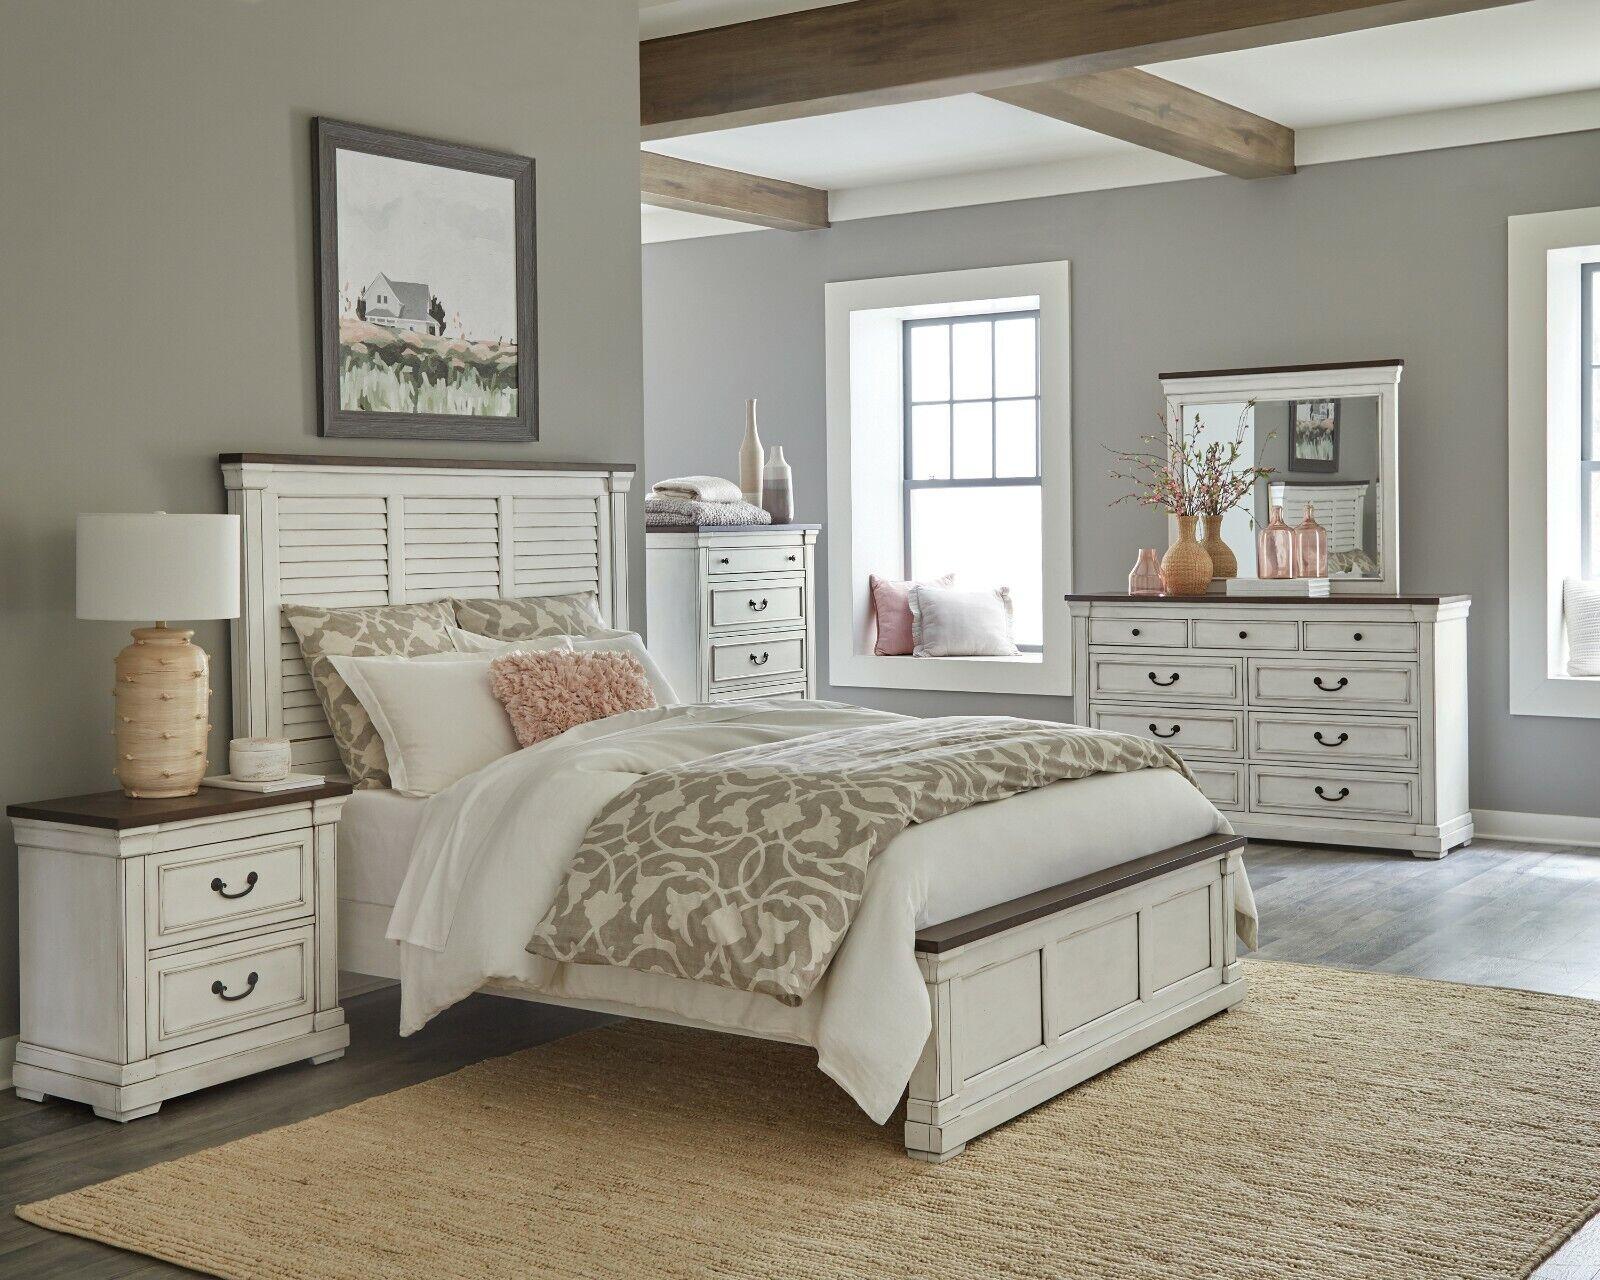 Roundhill Furniture White Bedroom Furniture Set Includes Bed Dresser Mirror 2 For Sale Online Ebay